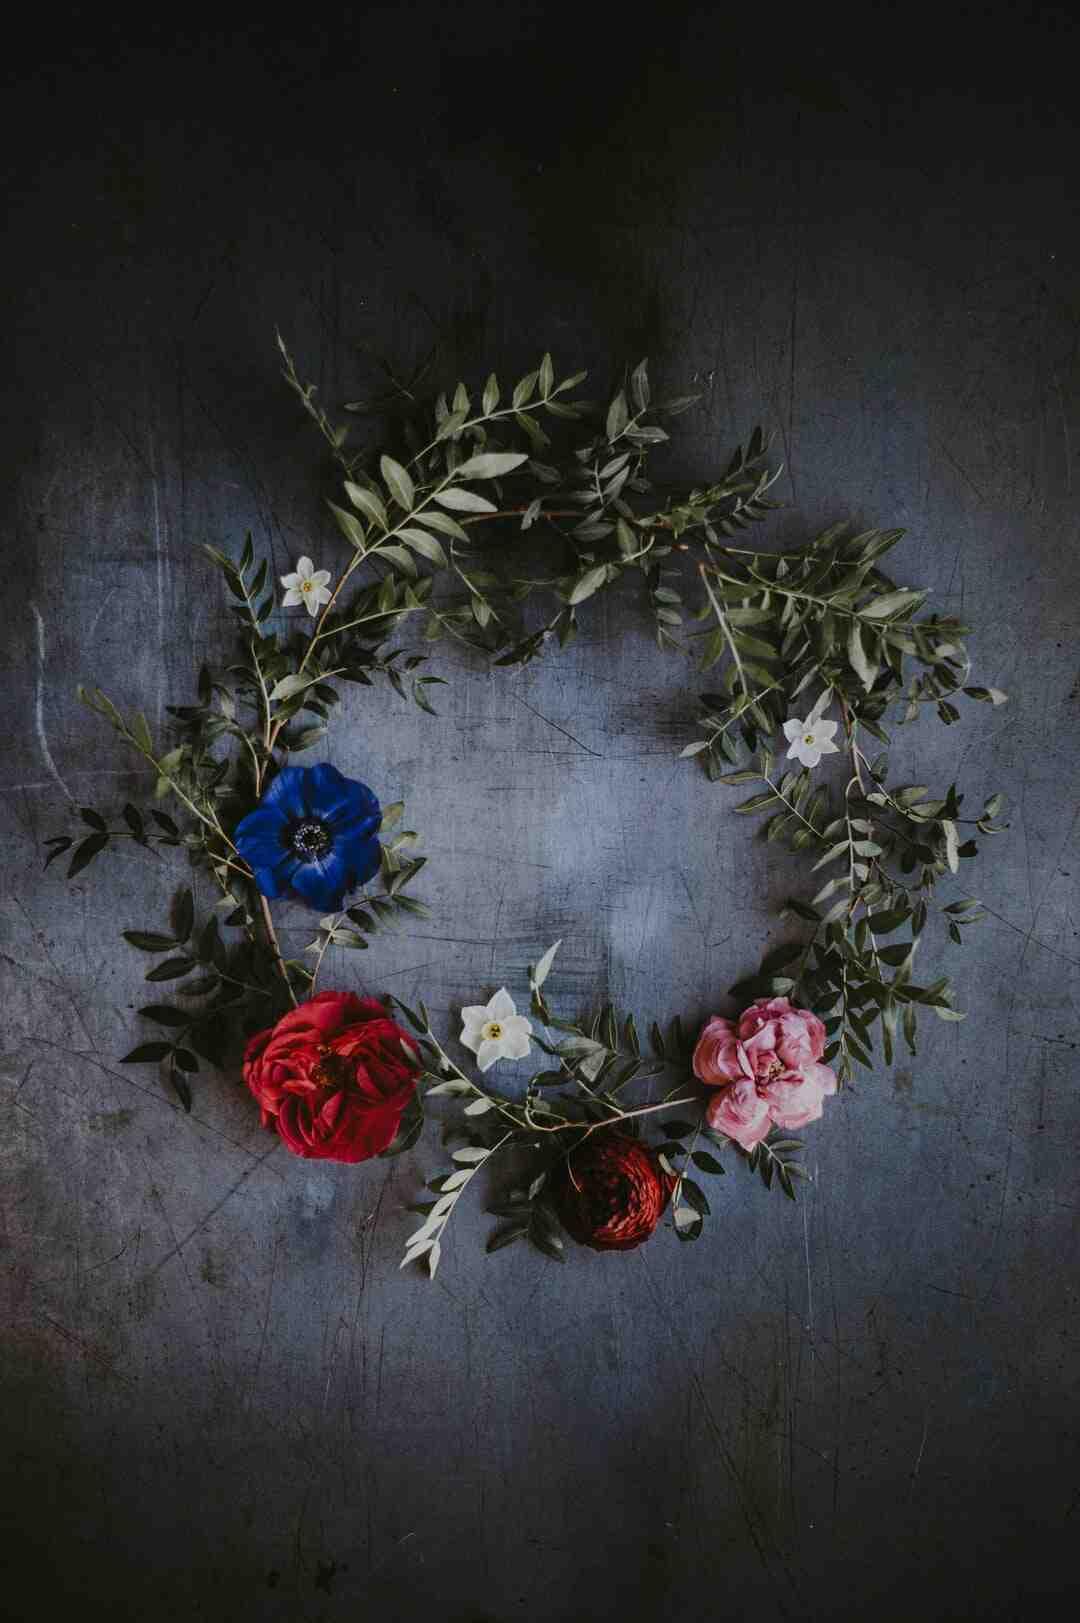 How to Make Floral Craft Arrangements